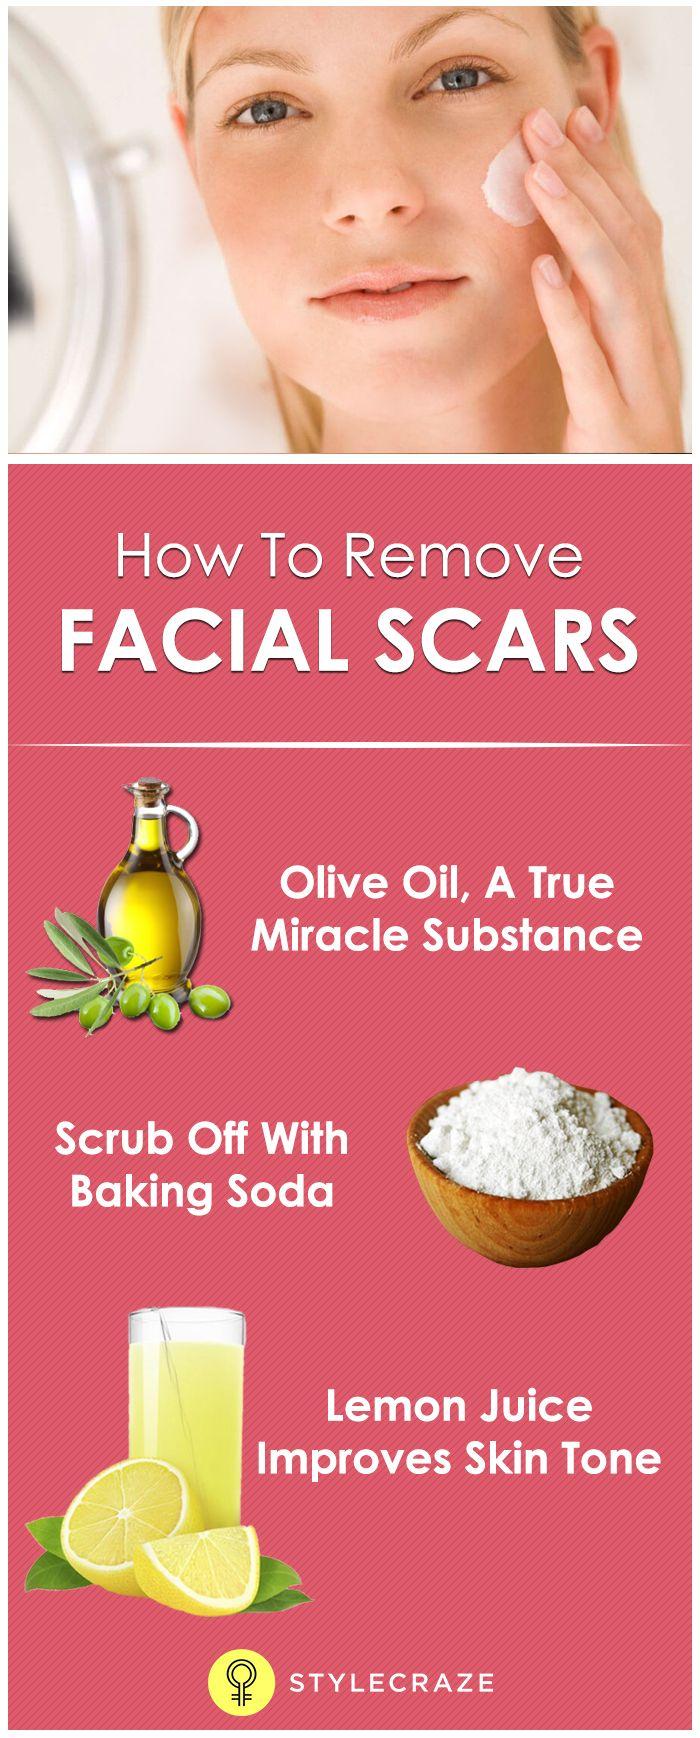 How To Remove Facial Scars NaturallyStylecraze